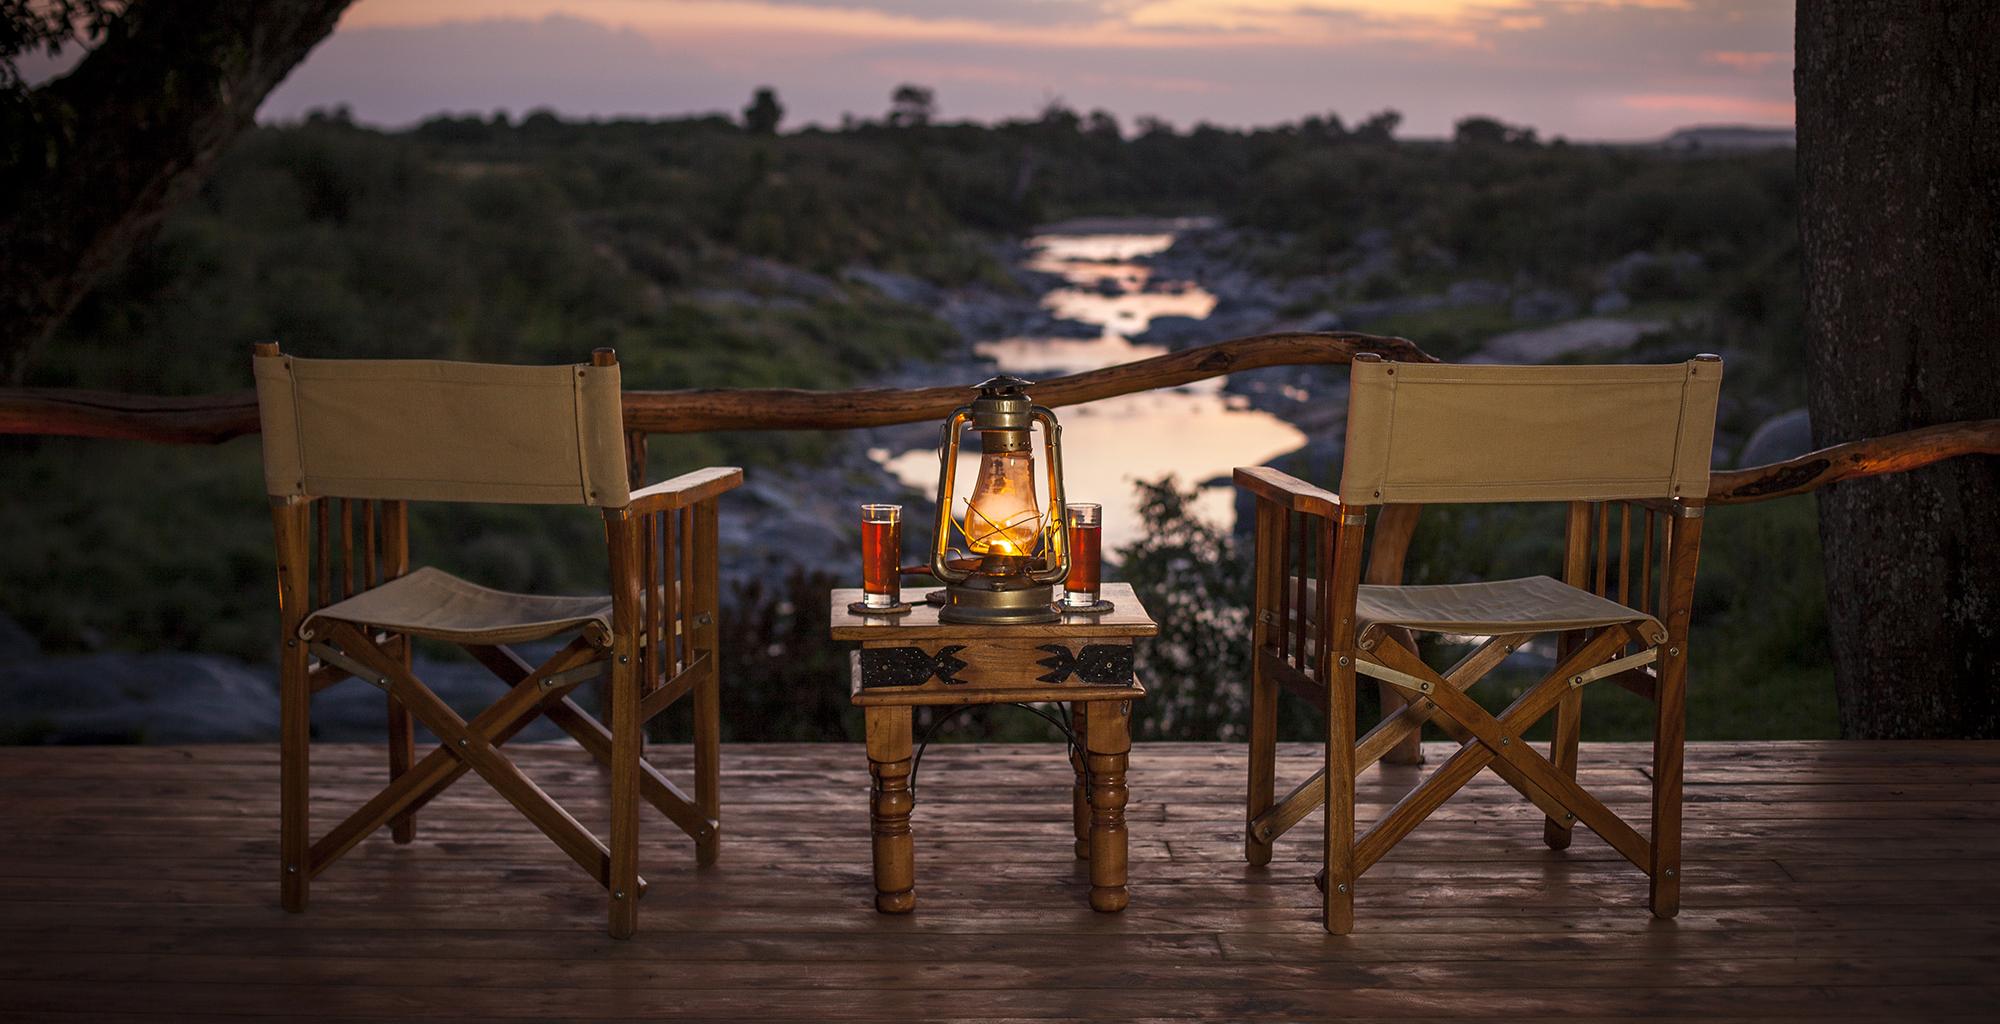 Kenya-Rekero-Tent-Camp-Deck